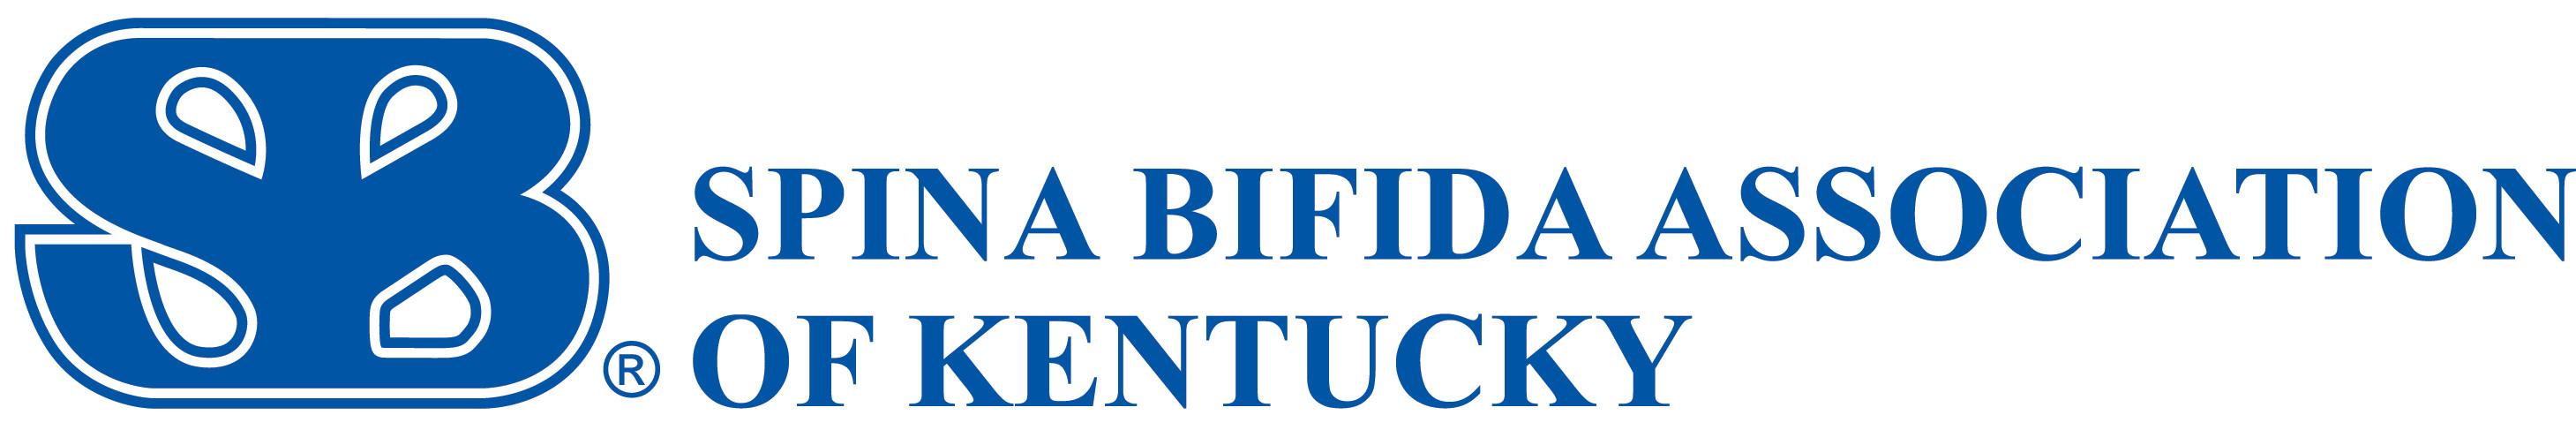 Spina Bifida Association of KY